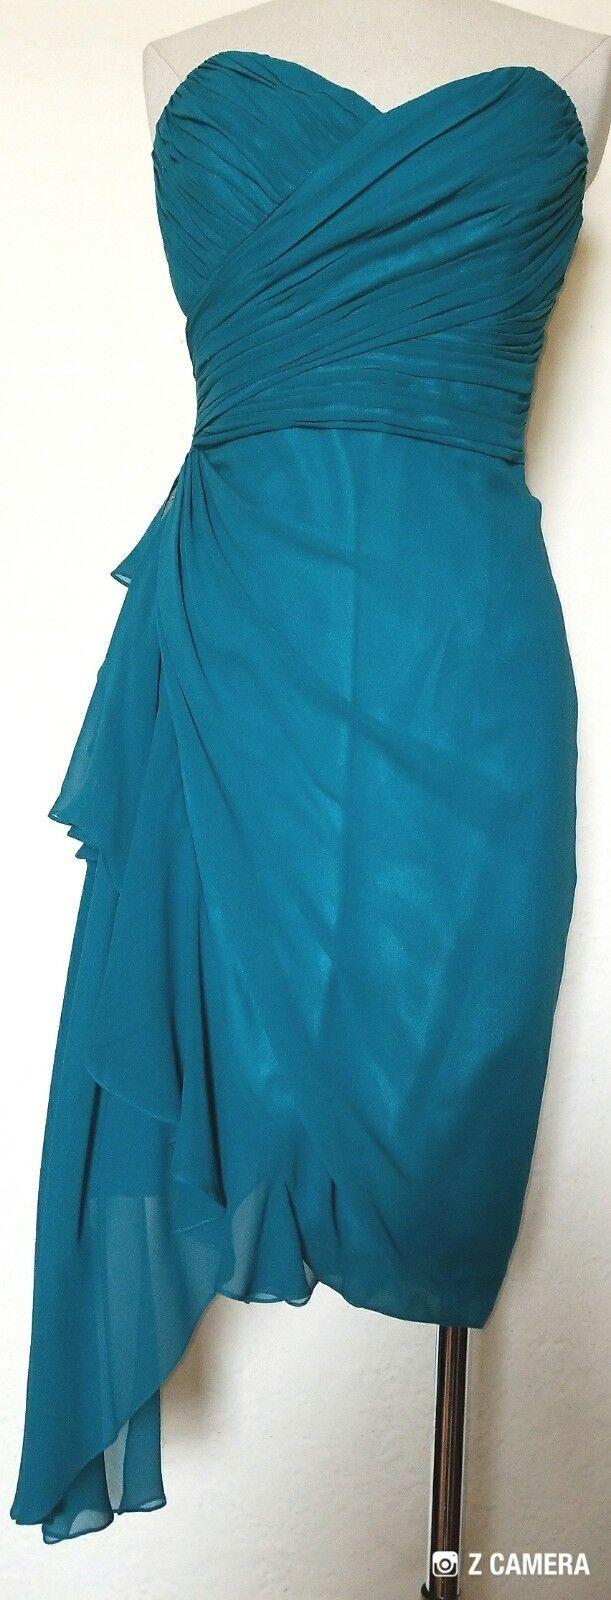 Badgley Mischka Turquoise Silk Side Side Side Sash Halter Dress Size 8 Show Stopper  448255